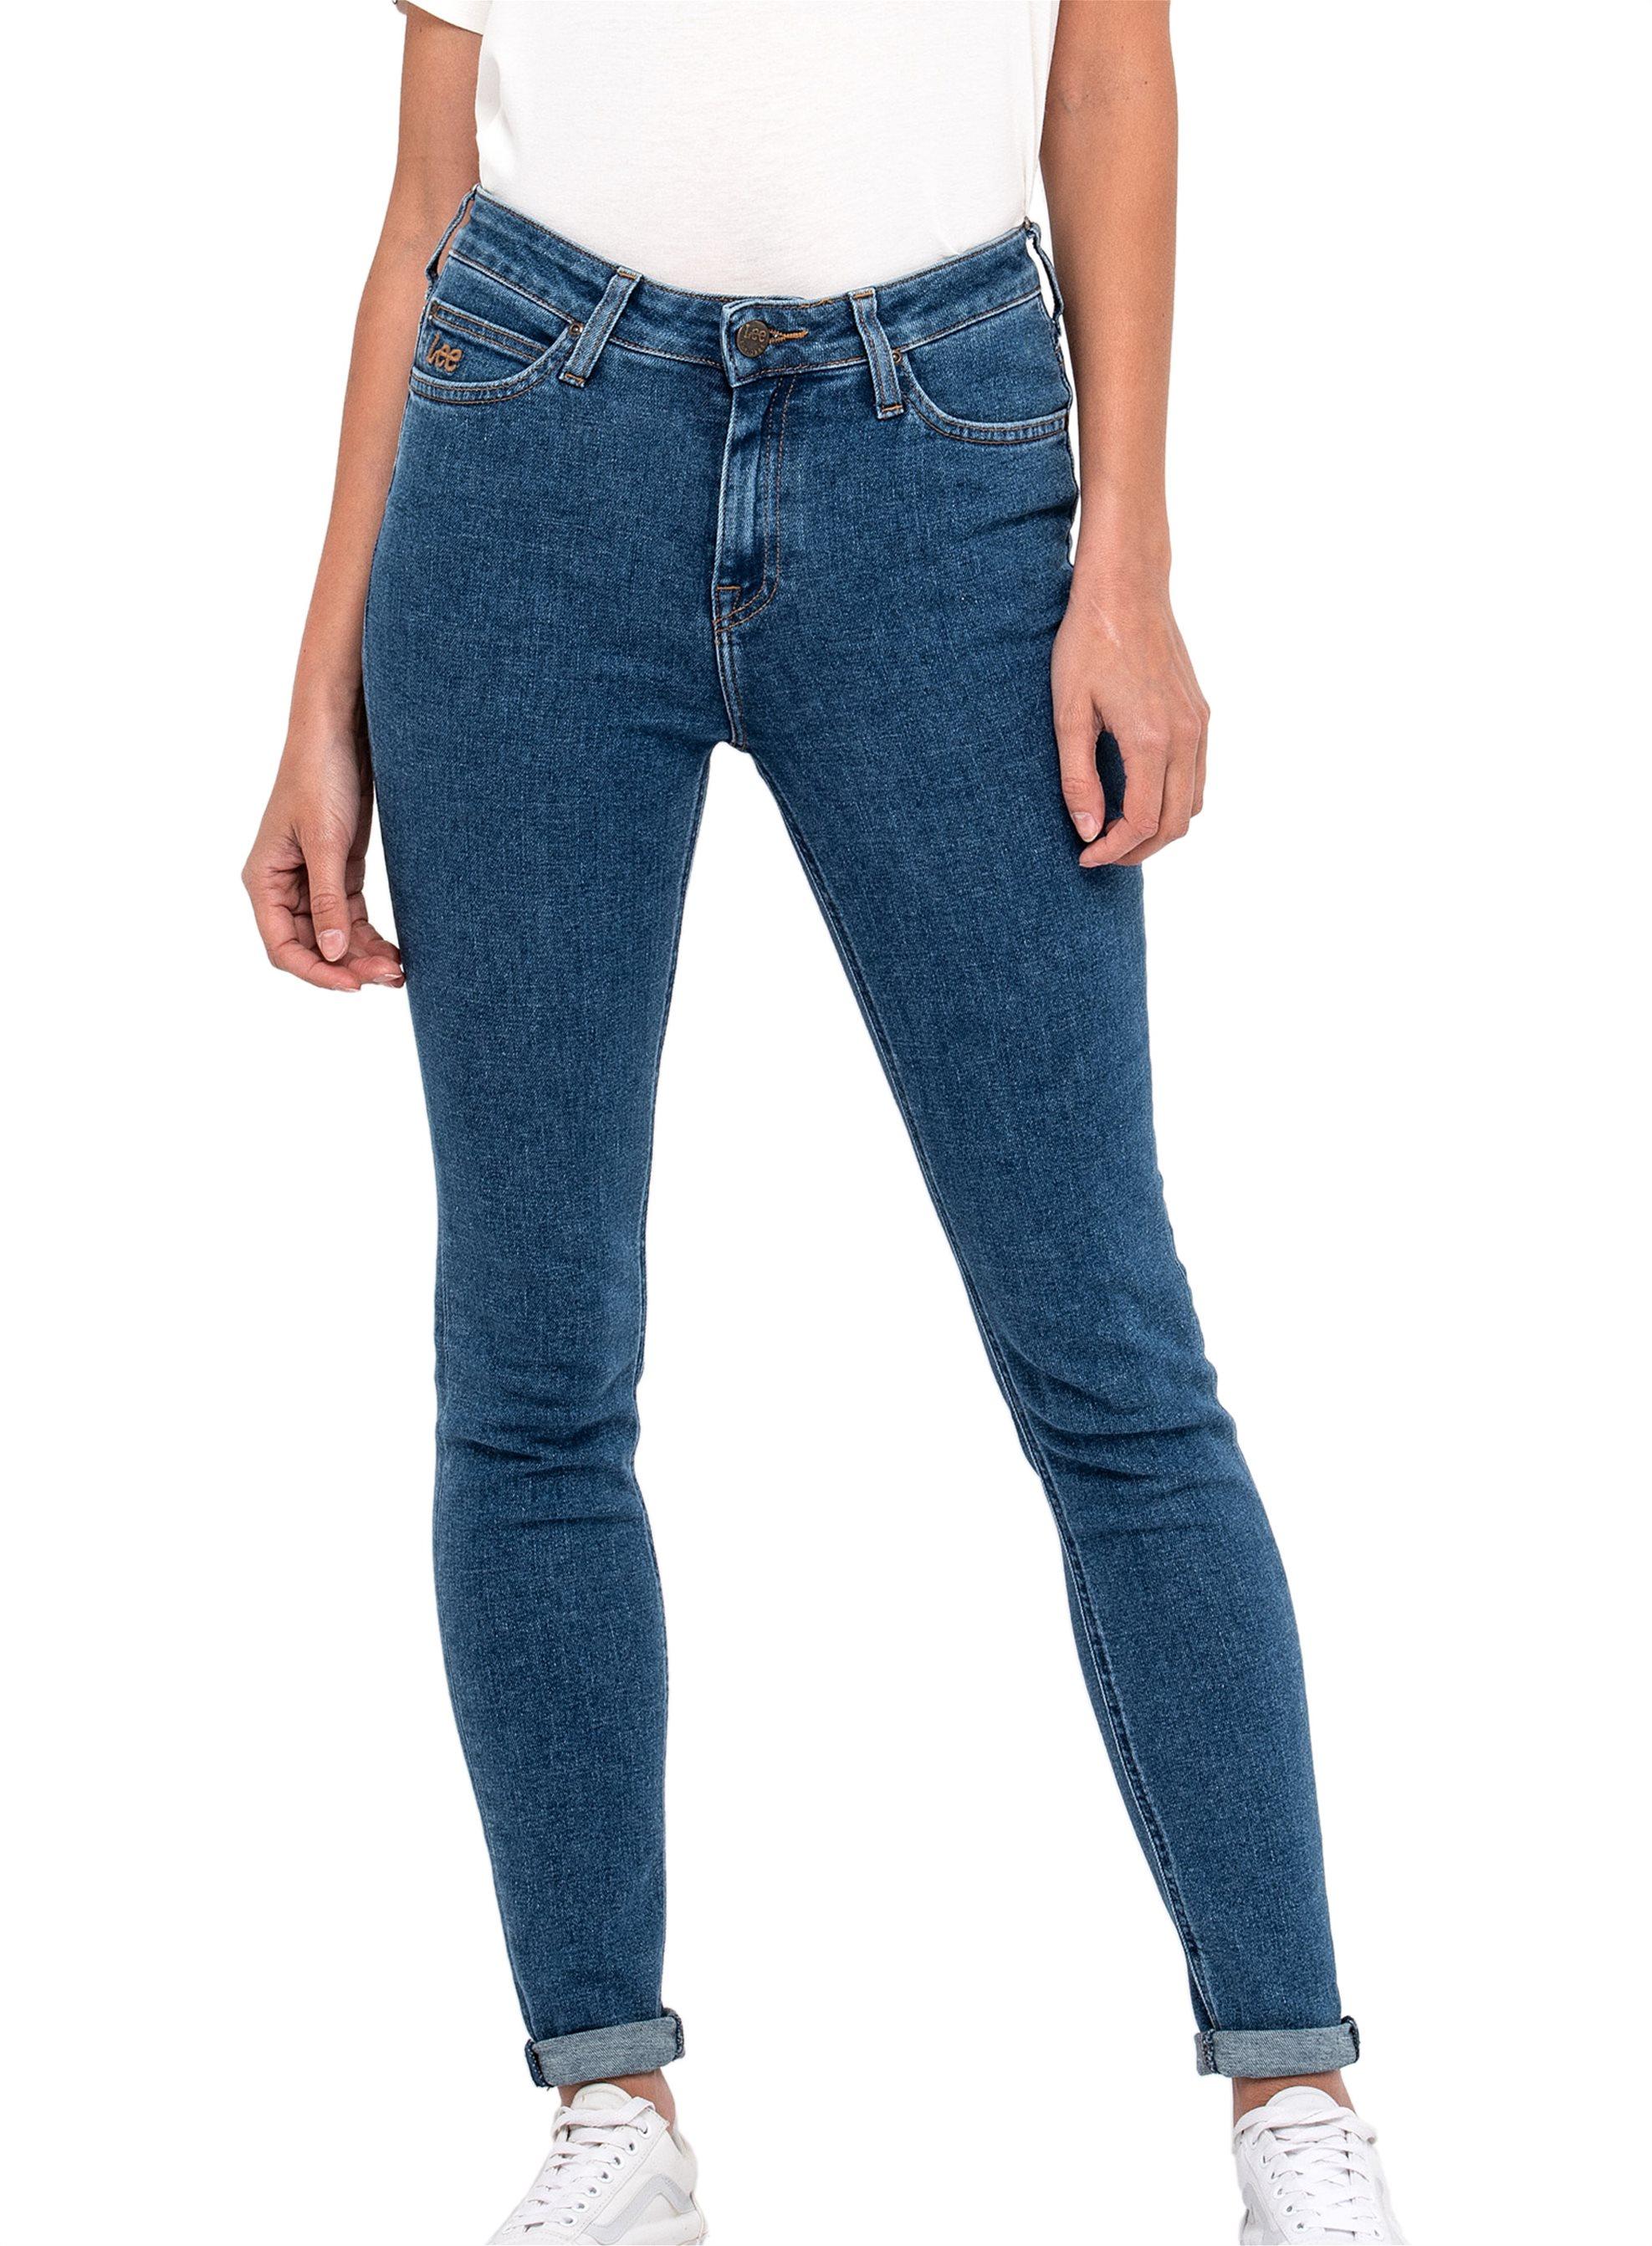 Notos Lee Scarlett High skinny γυναικείο τζην παντελόνι Flat Stone -  L31AROEO - Μπλε dbdf38a854b